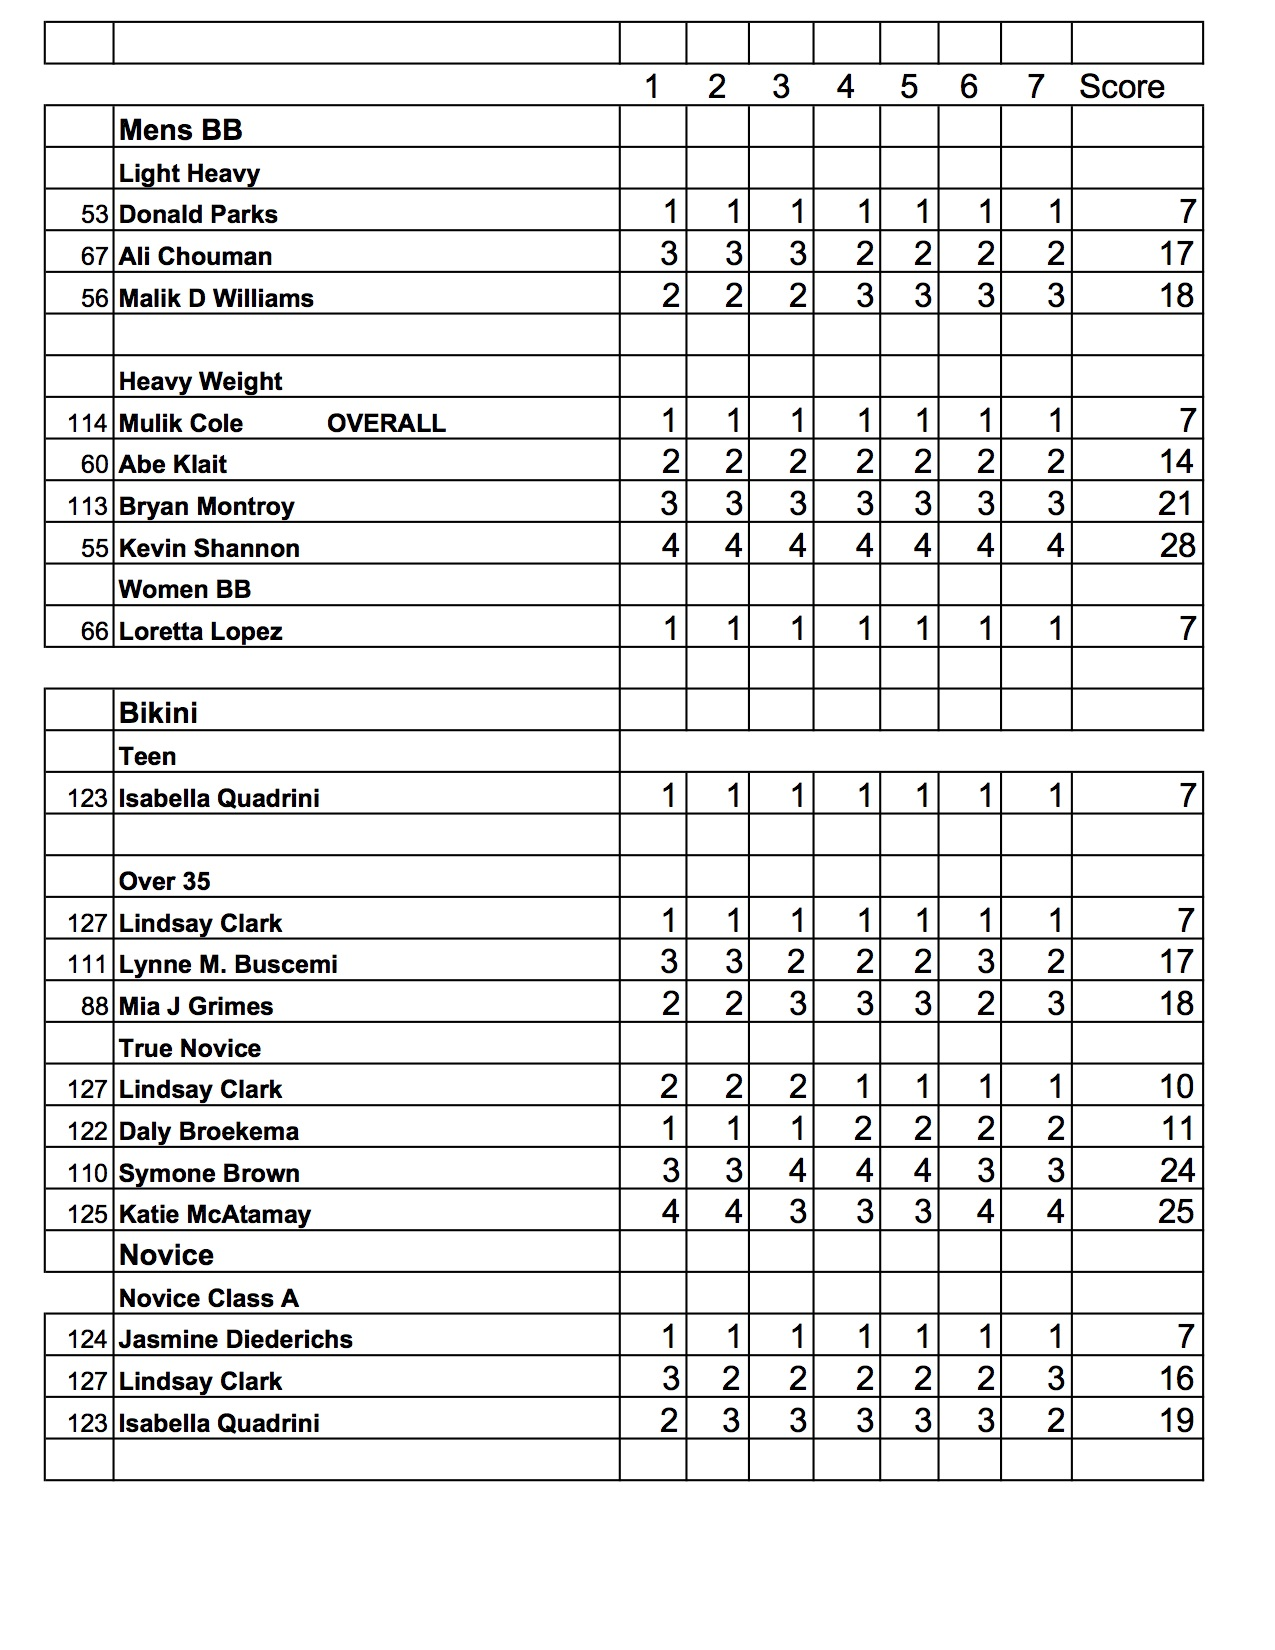 2017 NPC Lenda Murray Detroit Classic Final Results ...